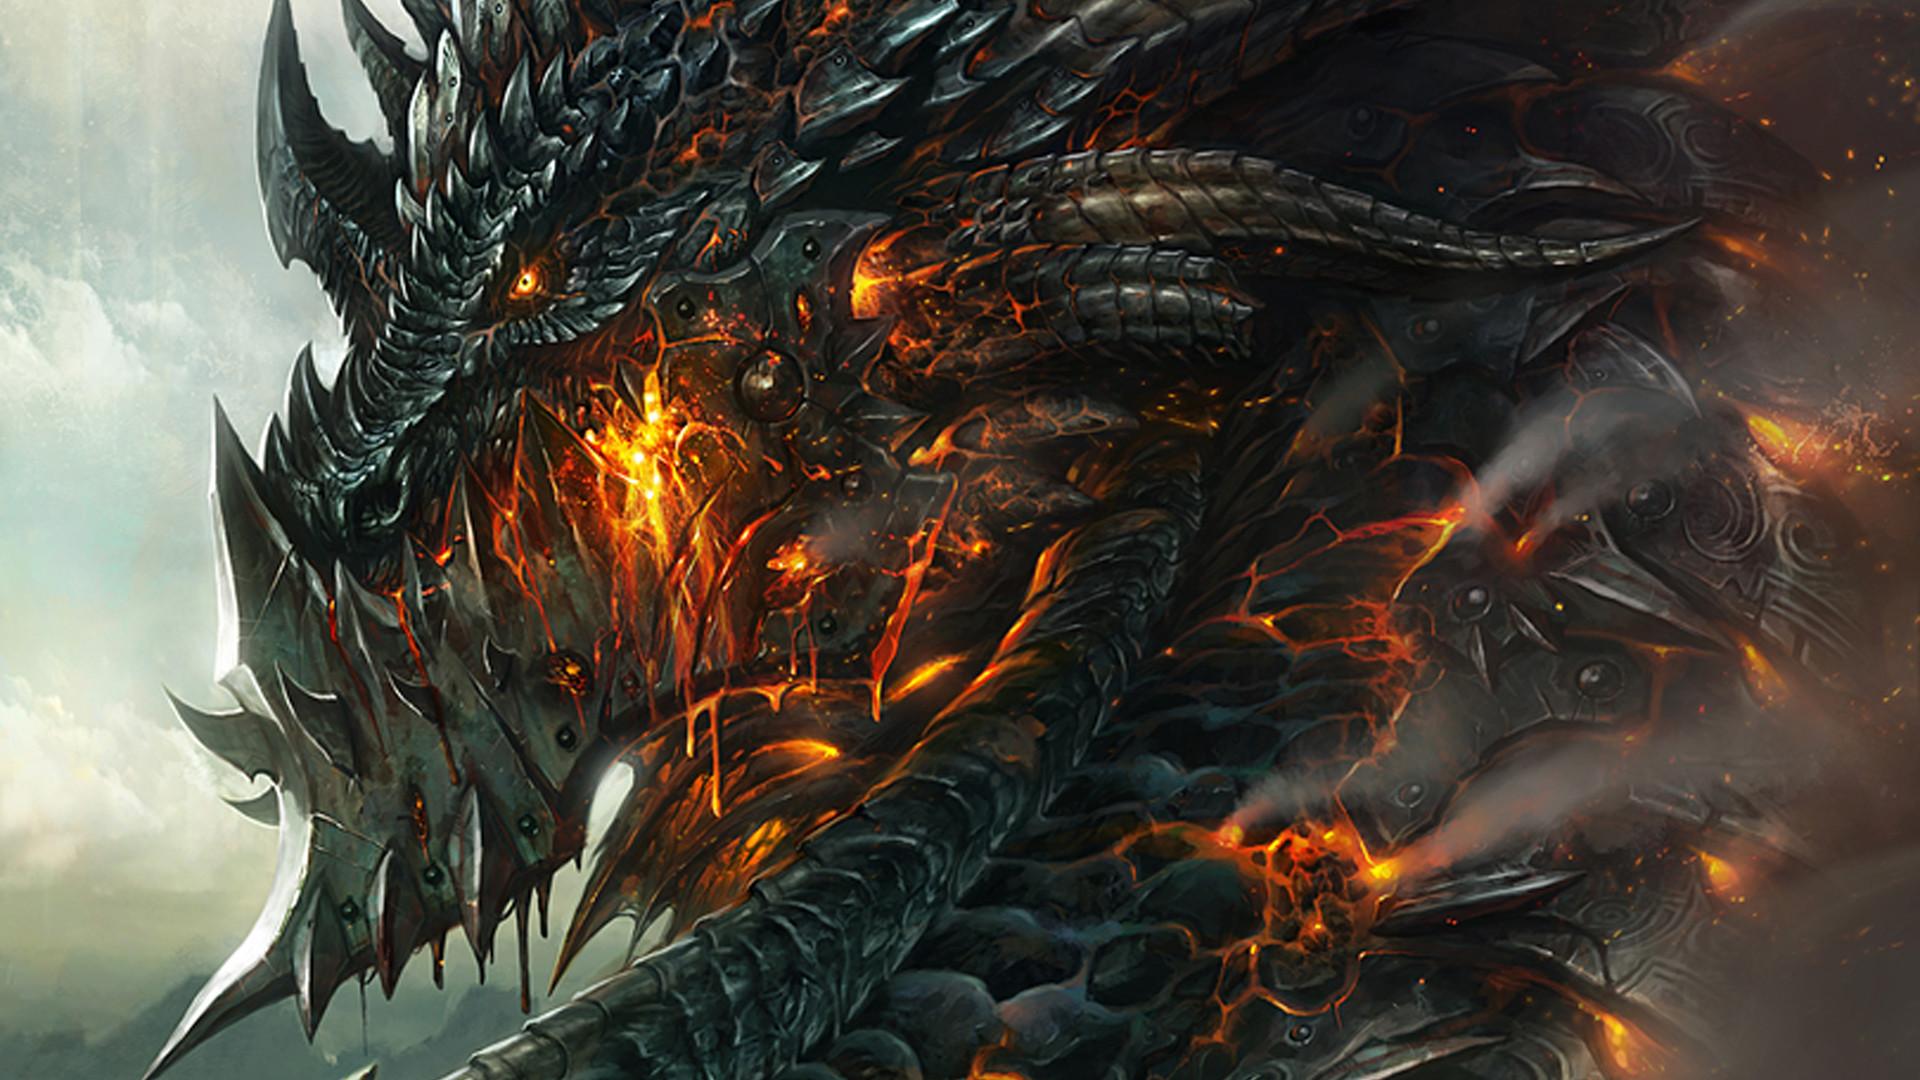 Black Dragon Wallpaper Hd 69 Images